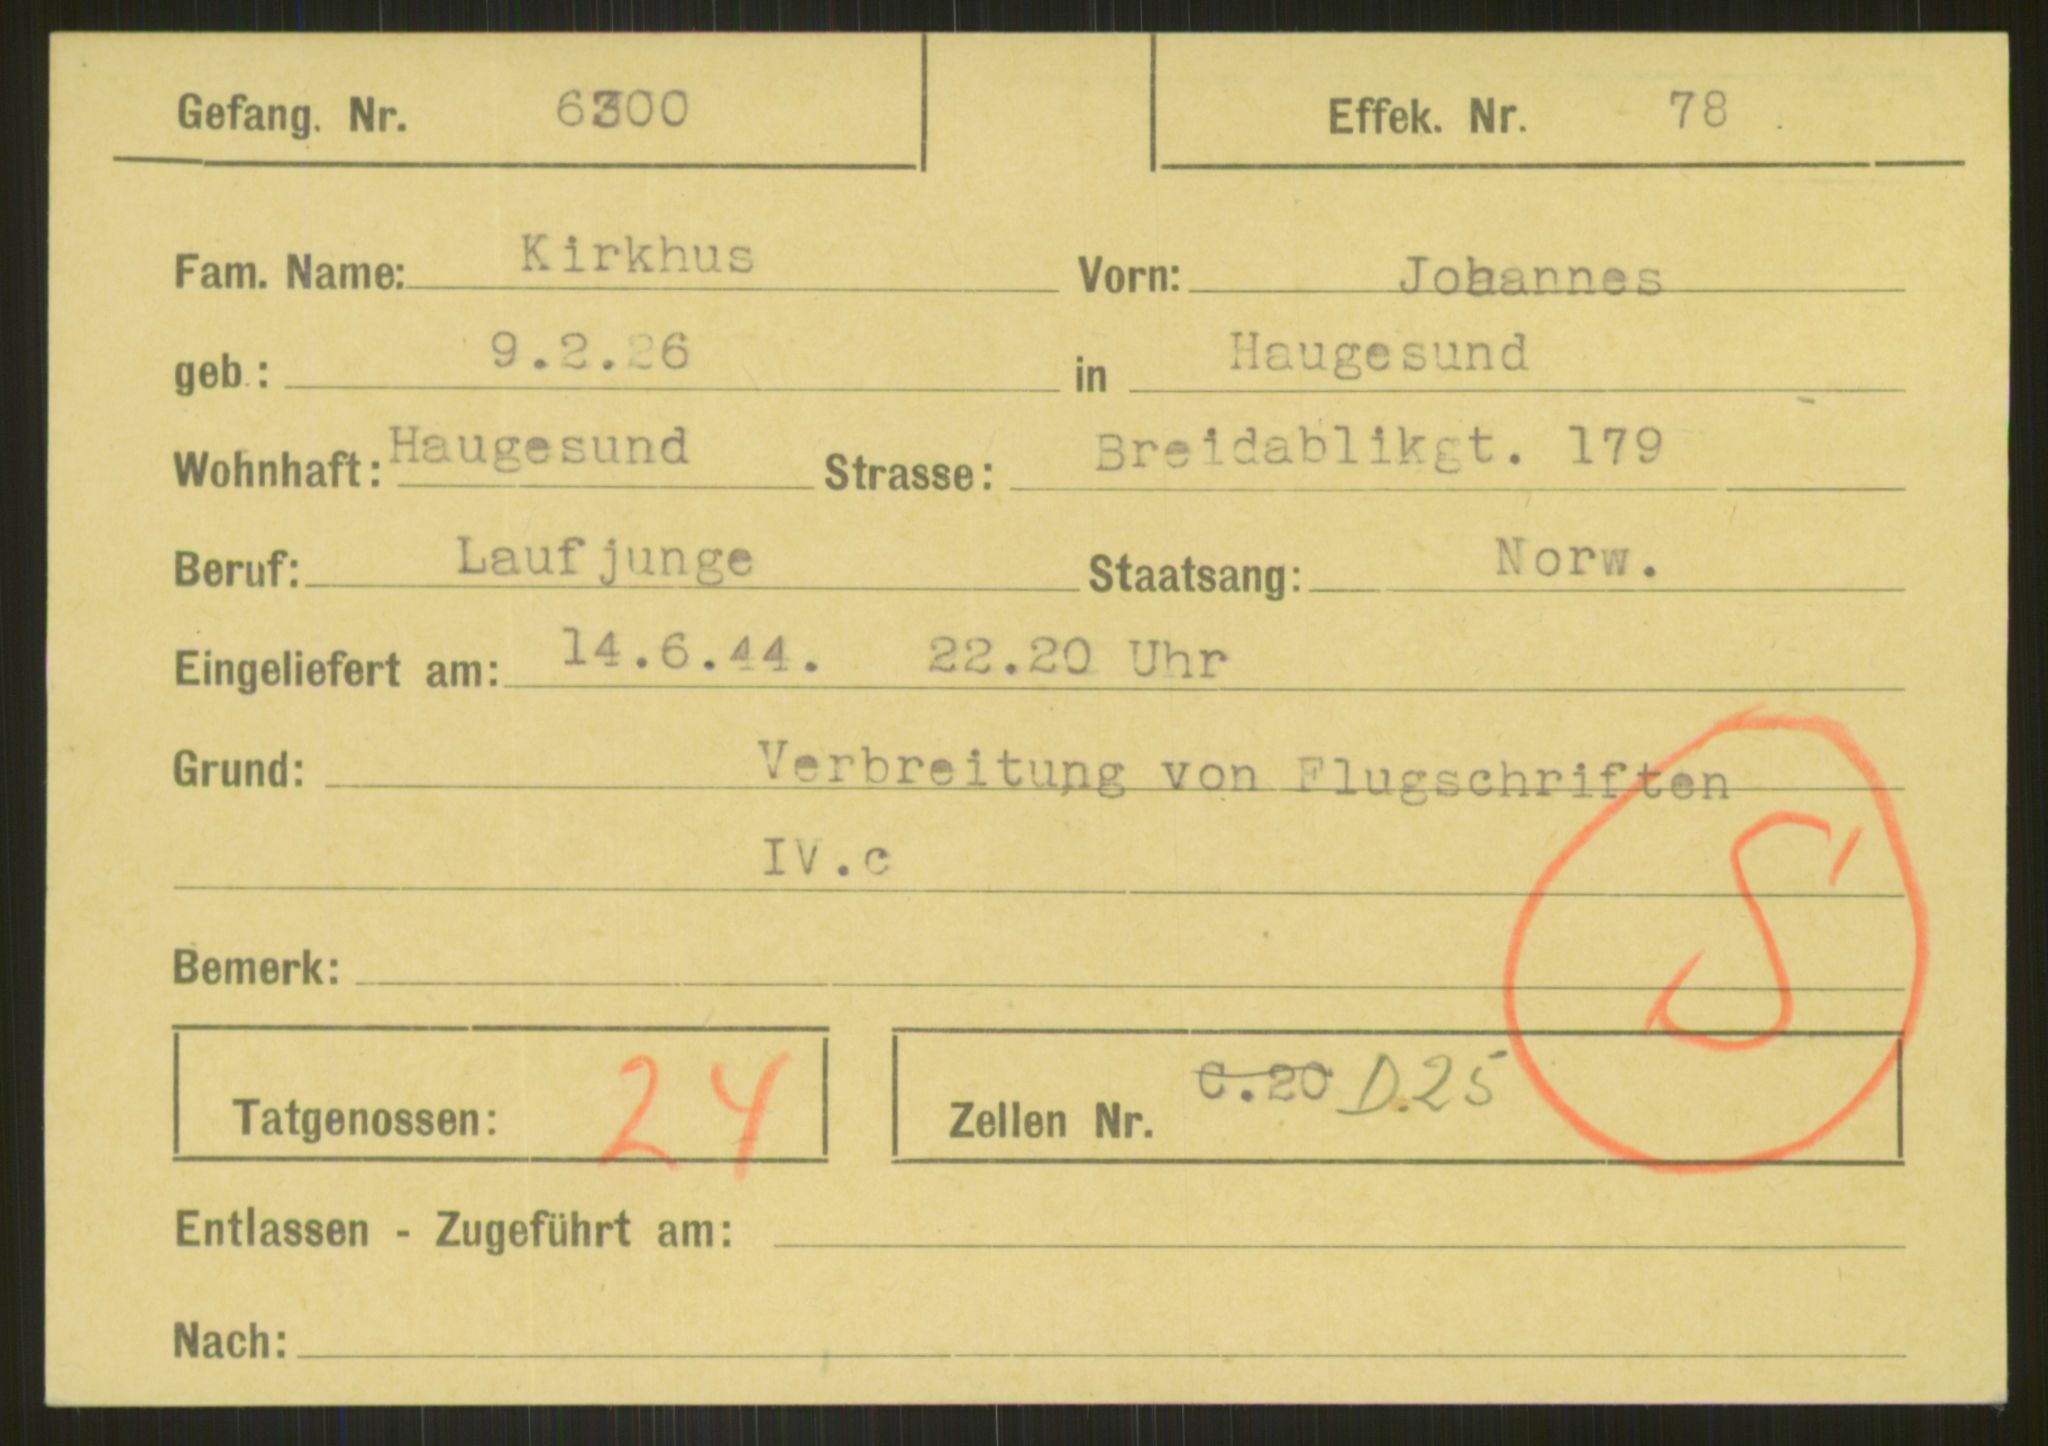 RA, Befehlshaber der Sicherheitspolizei und des SD, E/Ea/Eab/L0007: Register over norske fanger i Møllergata 19 ordnet etter fangenummer: 6300-7129, 1940-1945